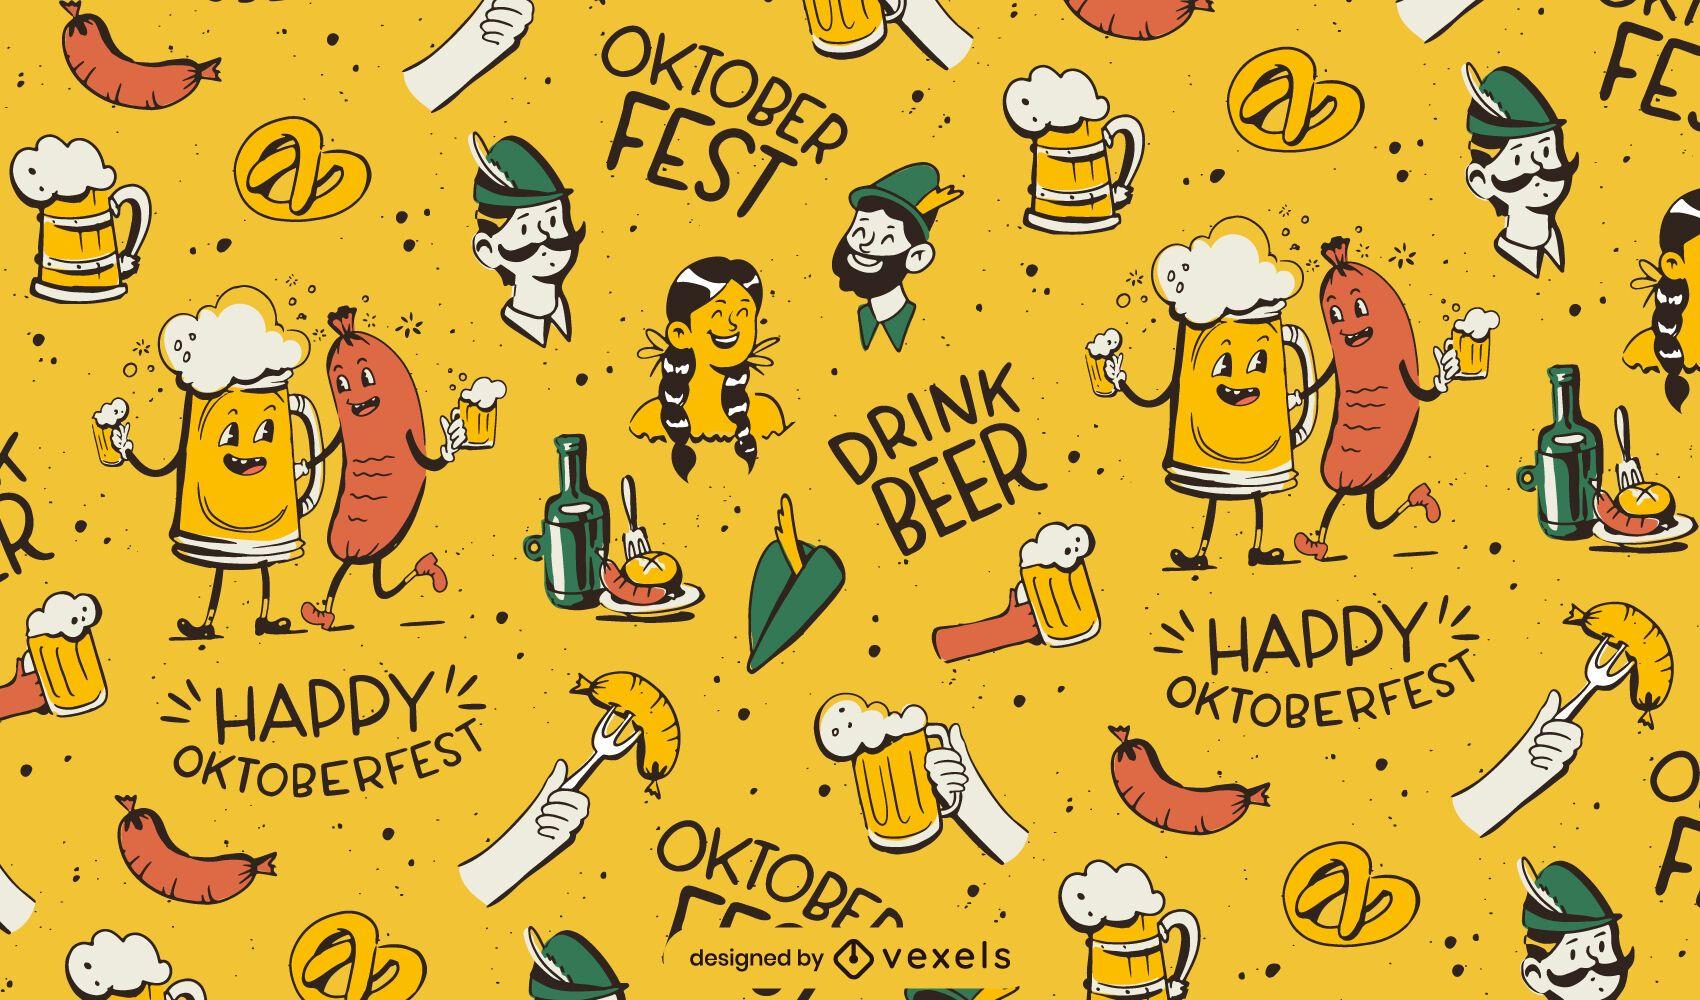 Patrón de personajes de dibujos animados de Oktoberfest